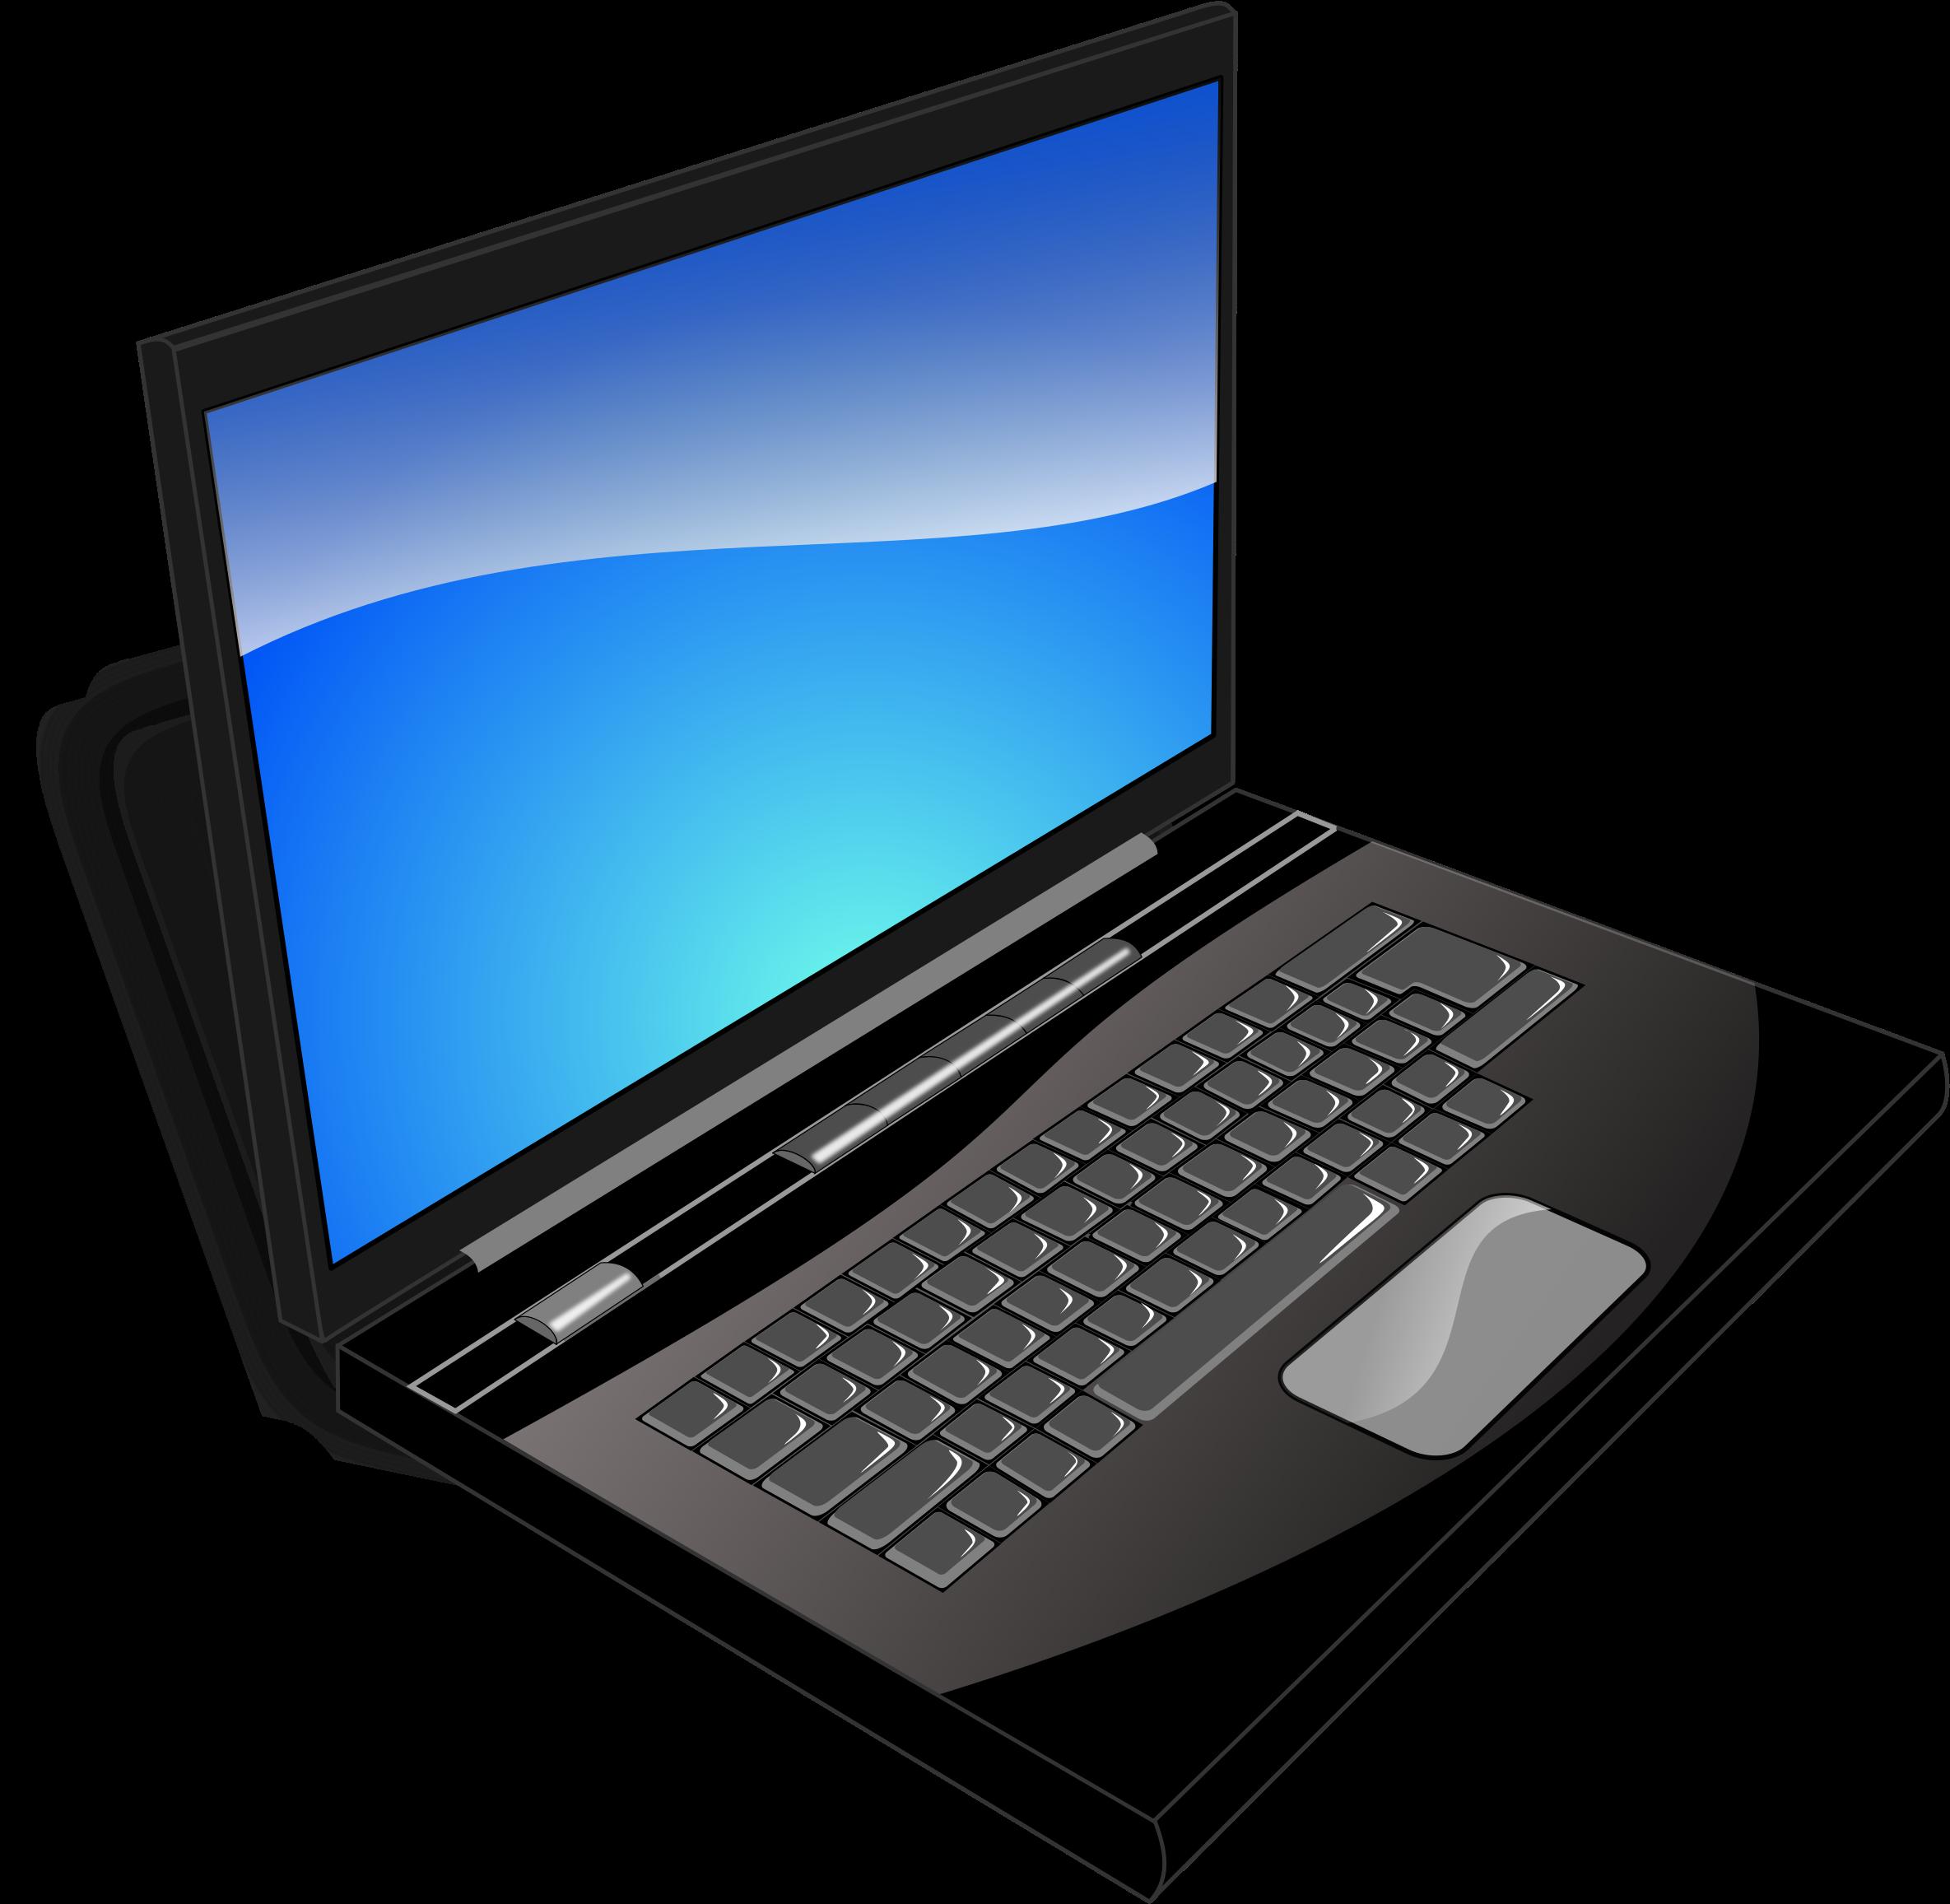 Computer Clipart Transparent Background.